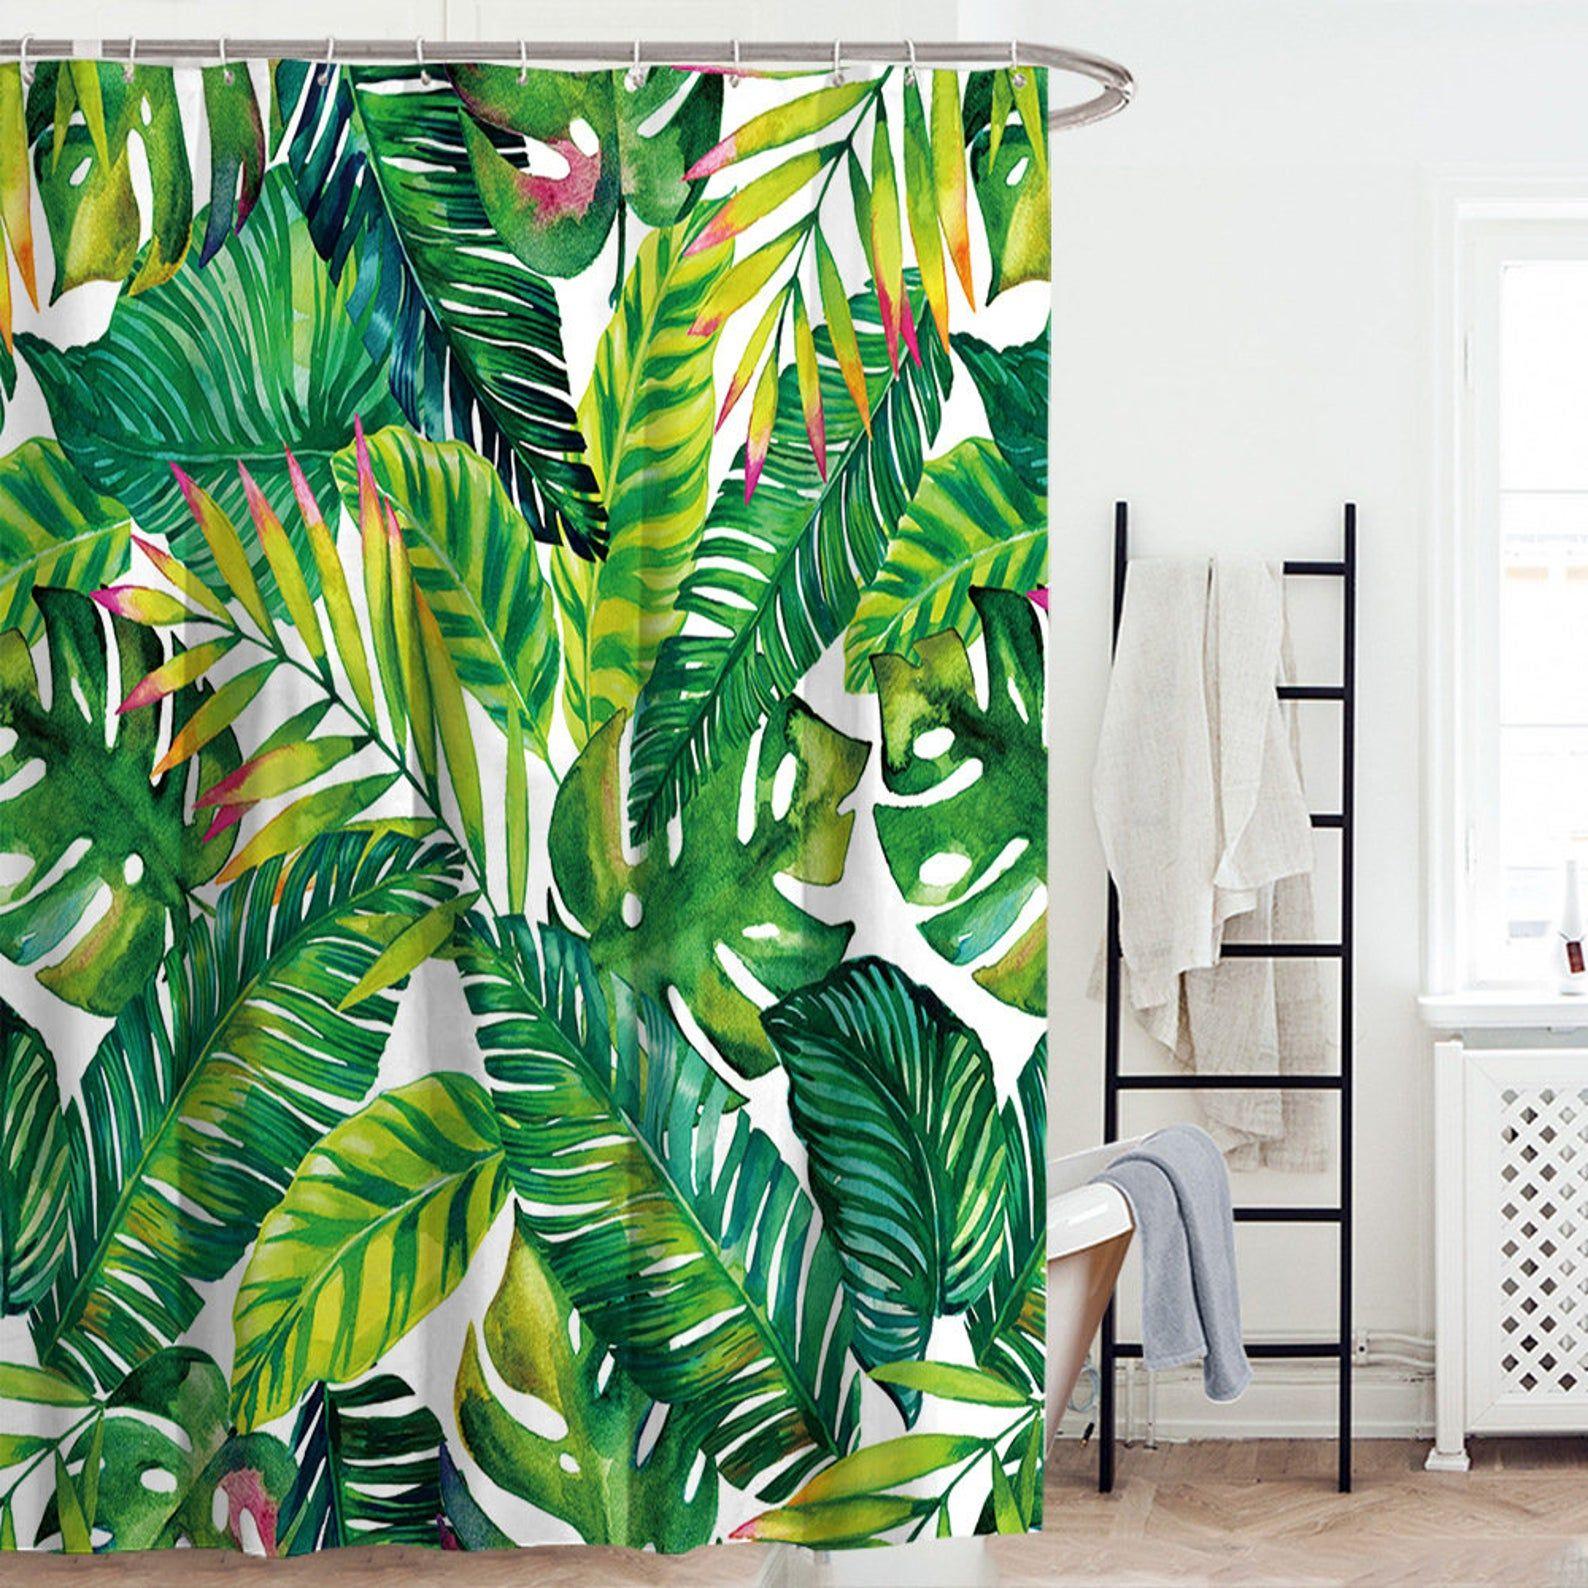 Tropical Banana Leaf Shower Curtain Bath For Bathroom Fiber Etsy